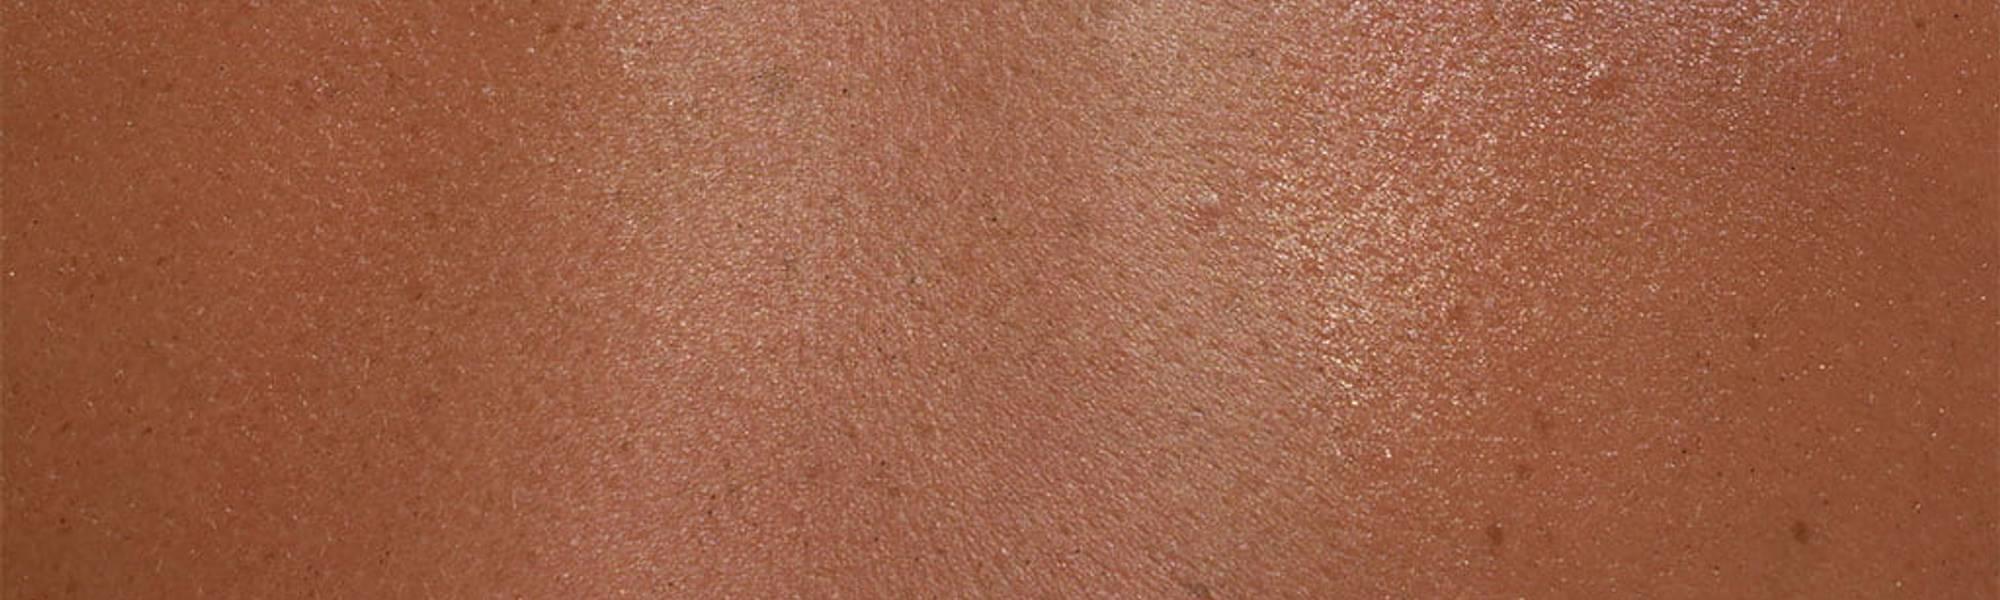 Larocheposay ArticlePage Allergic Skin allergy sensitive skin and reac